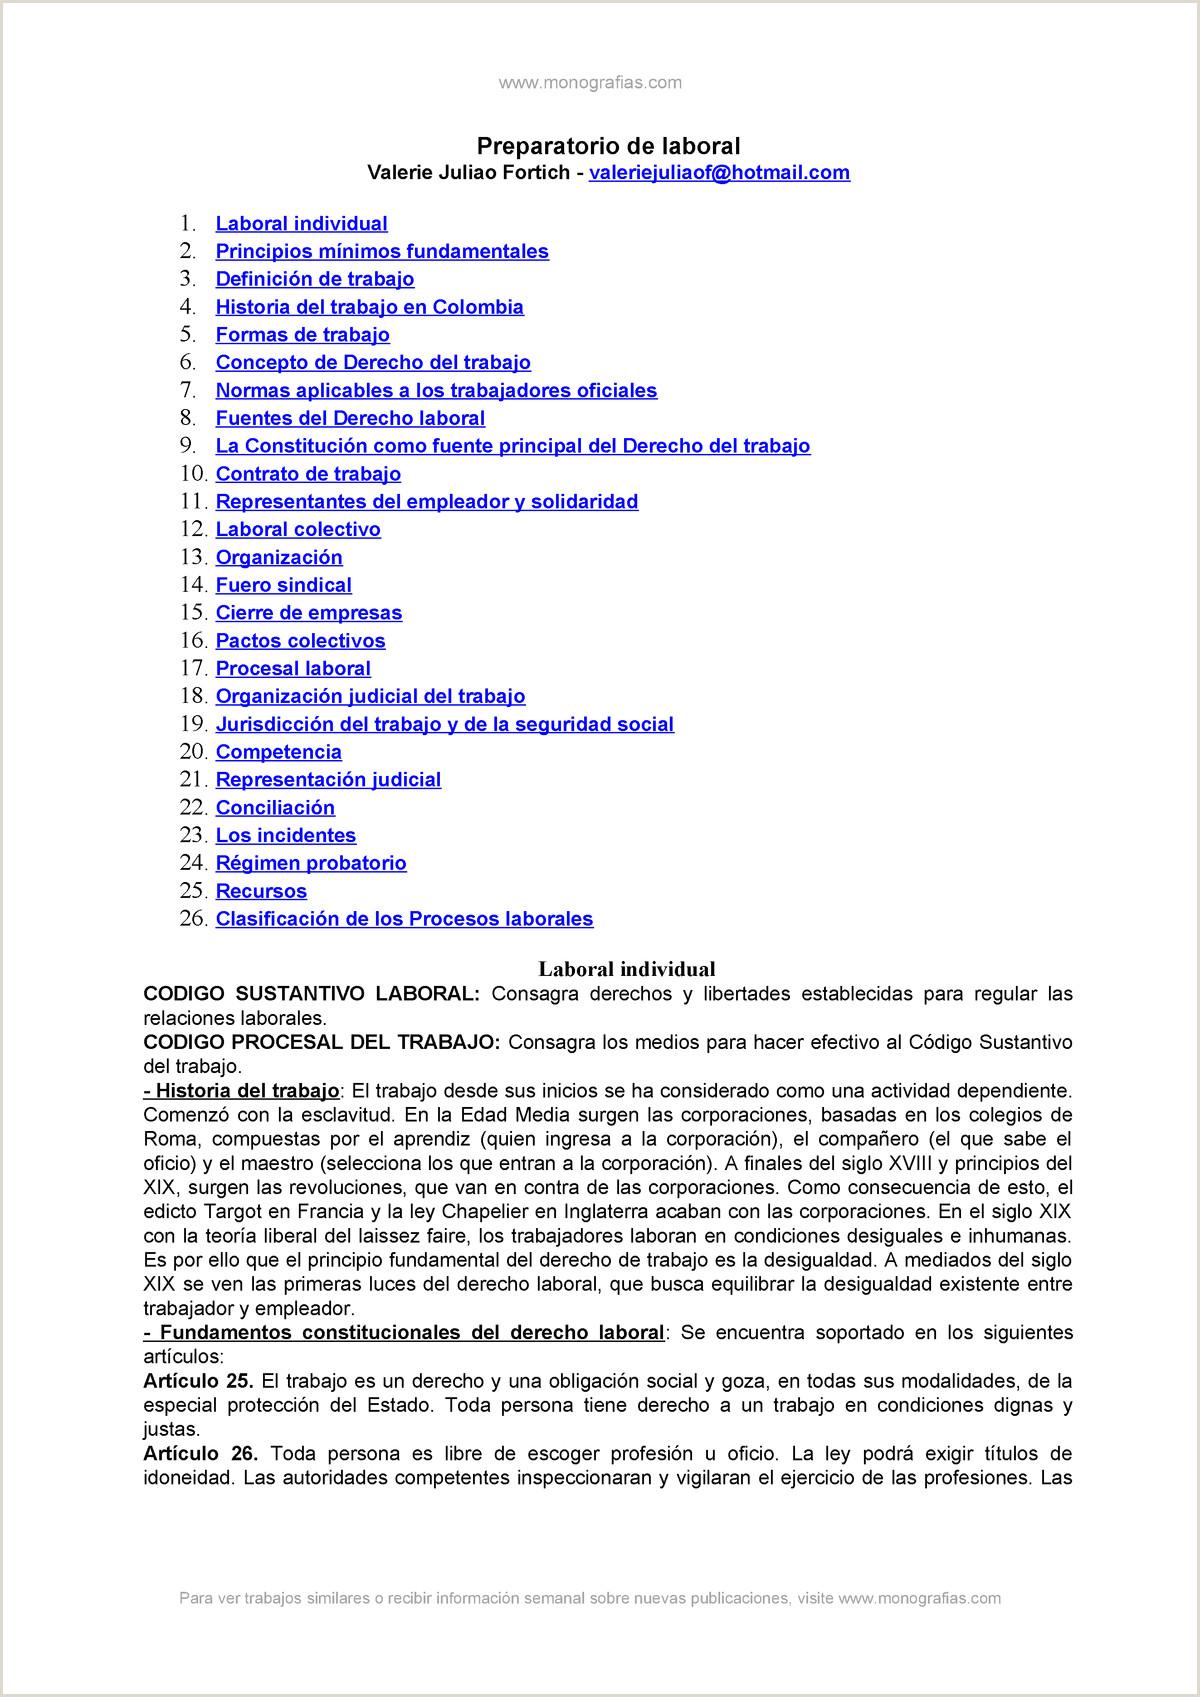 Preparatorio laboral FP Microecnoma StuDocu